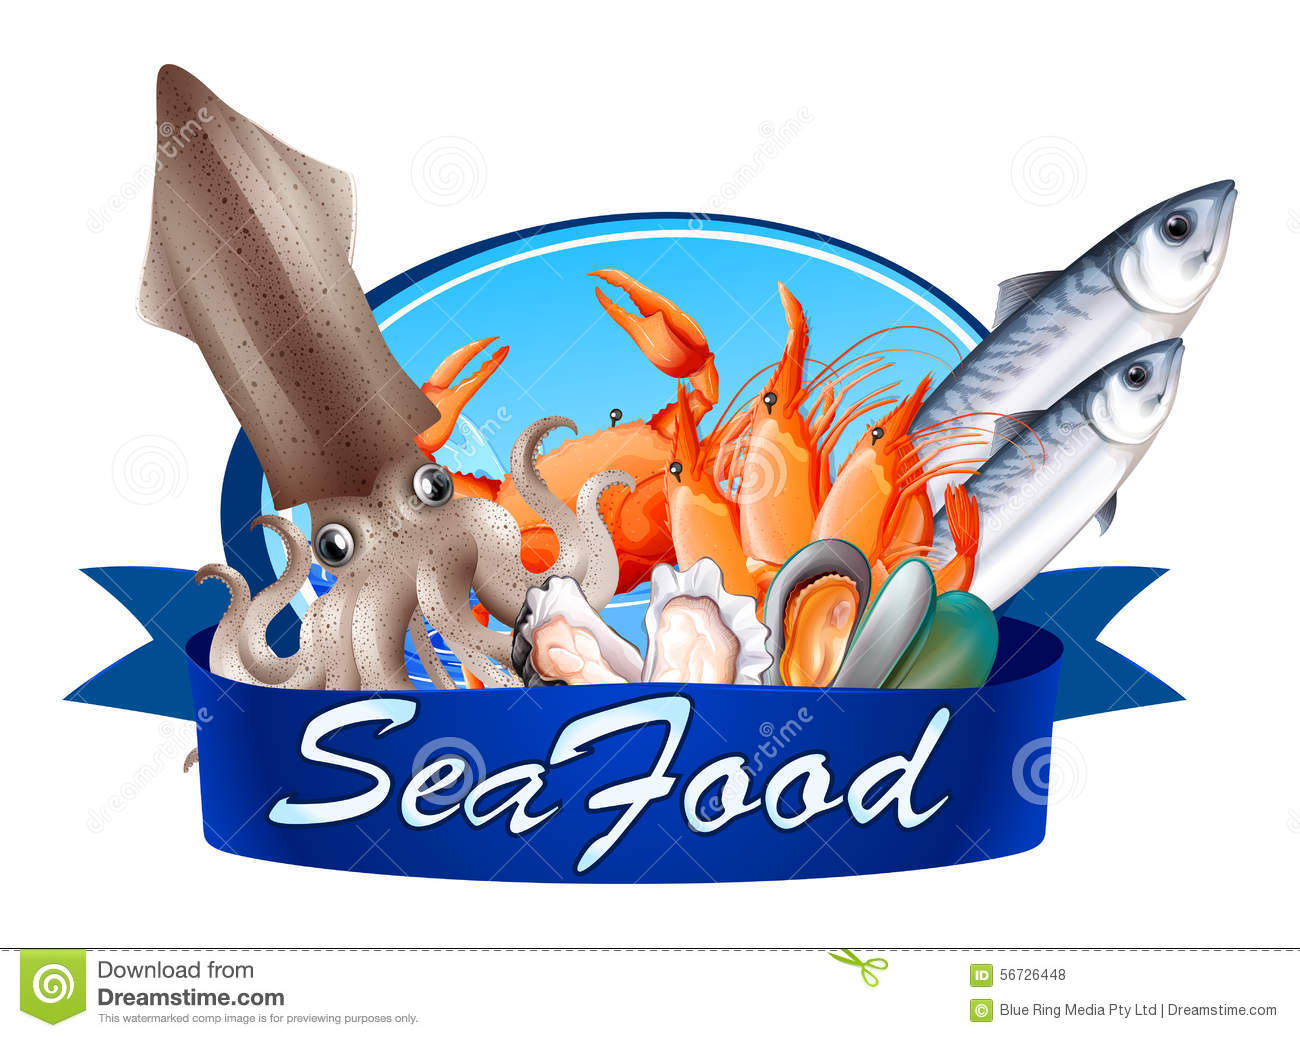 fish restaurant clipart